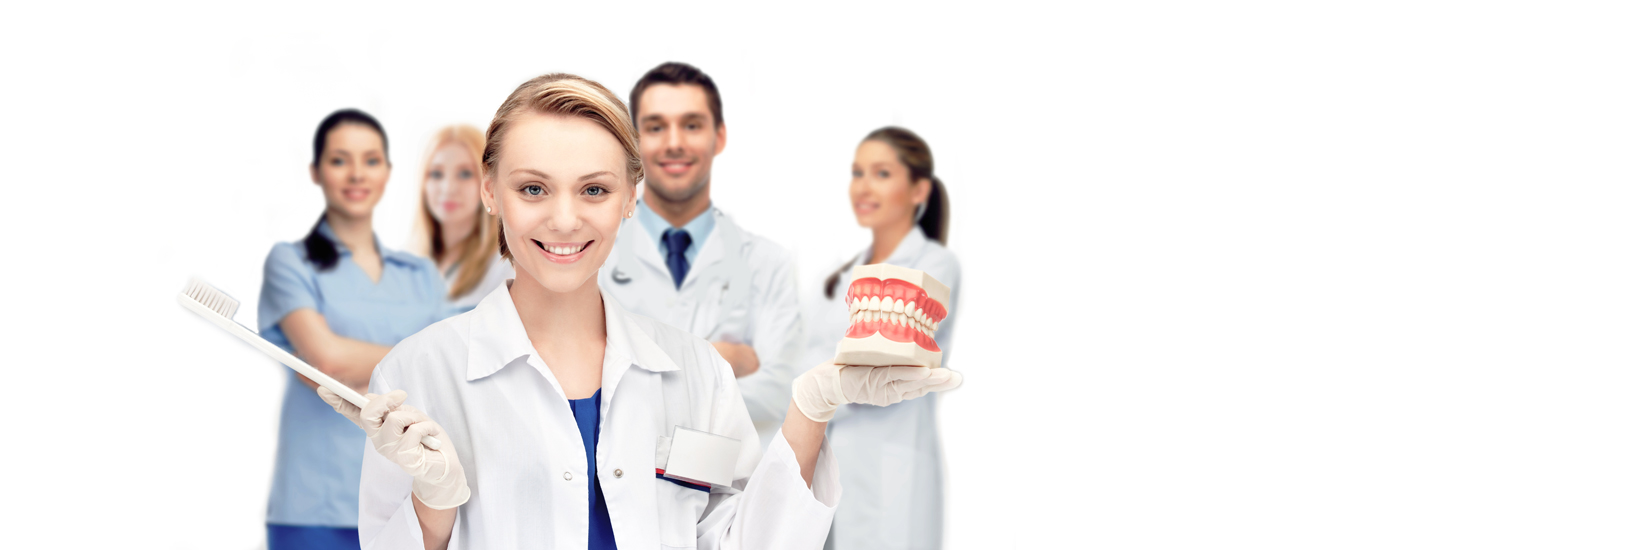 Reliance-Dental_Slider_FAQ-01